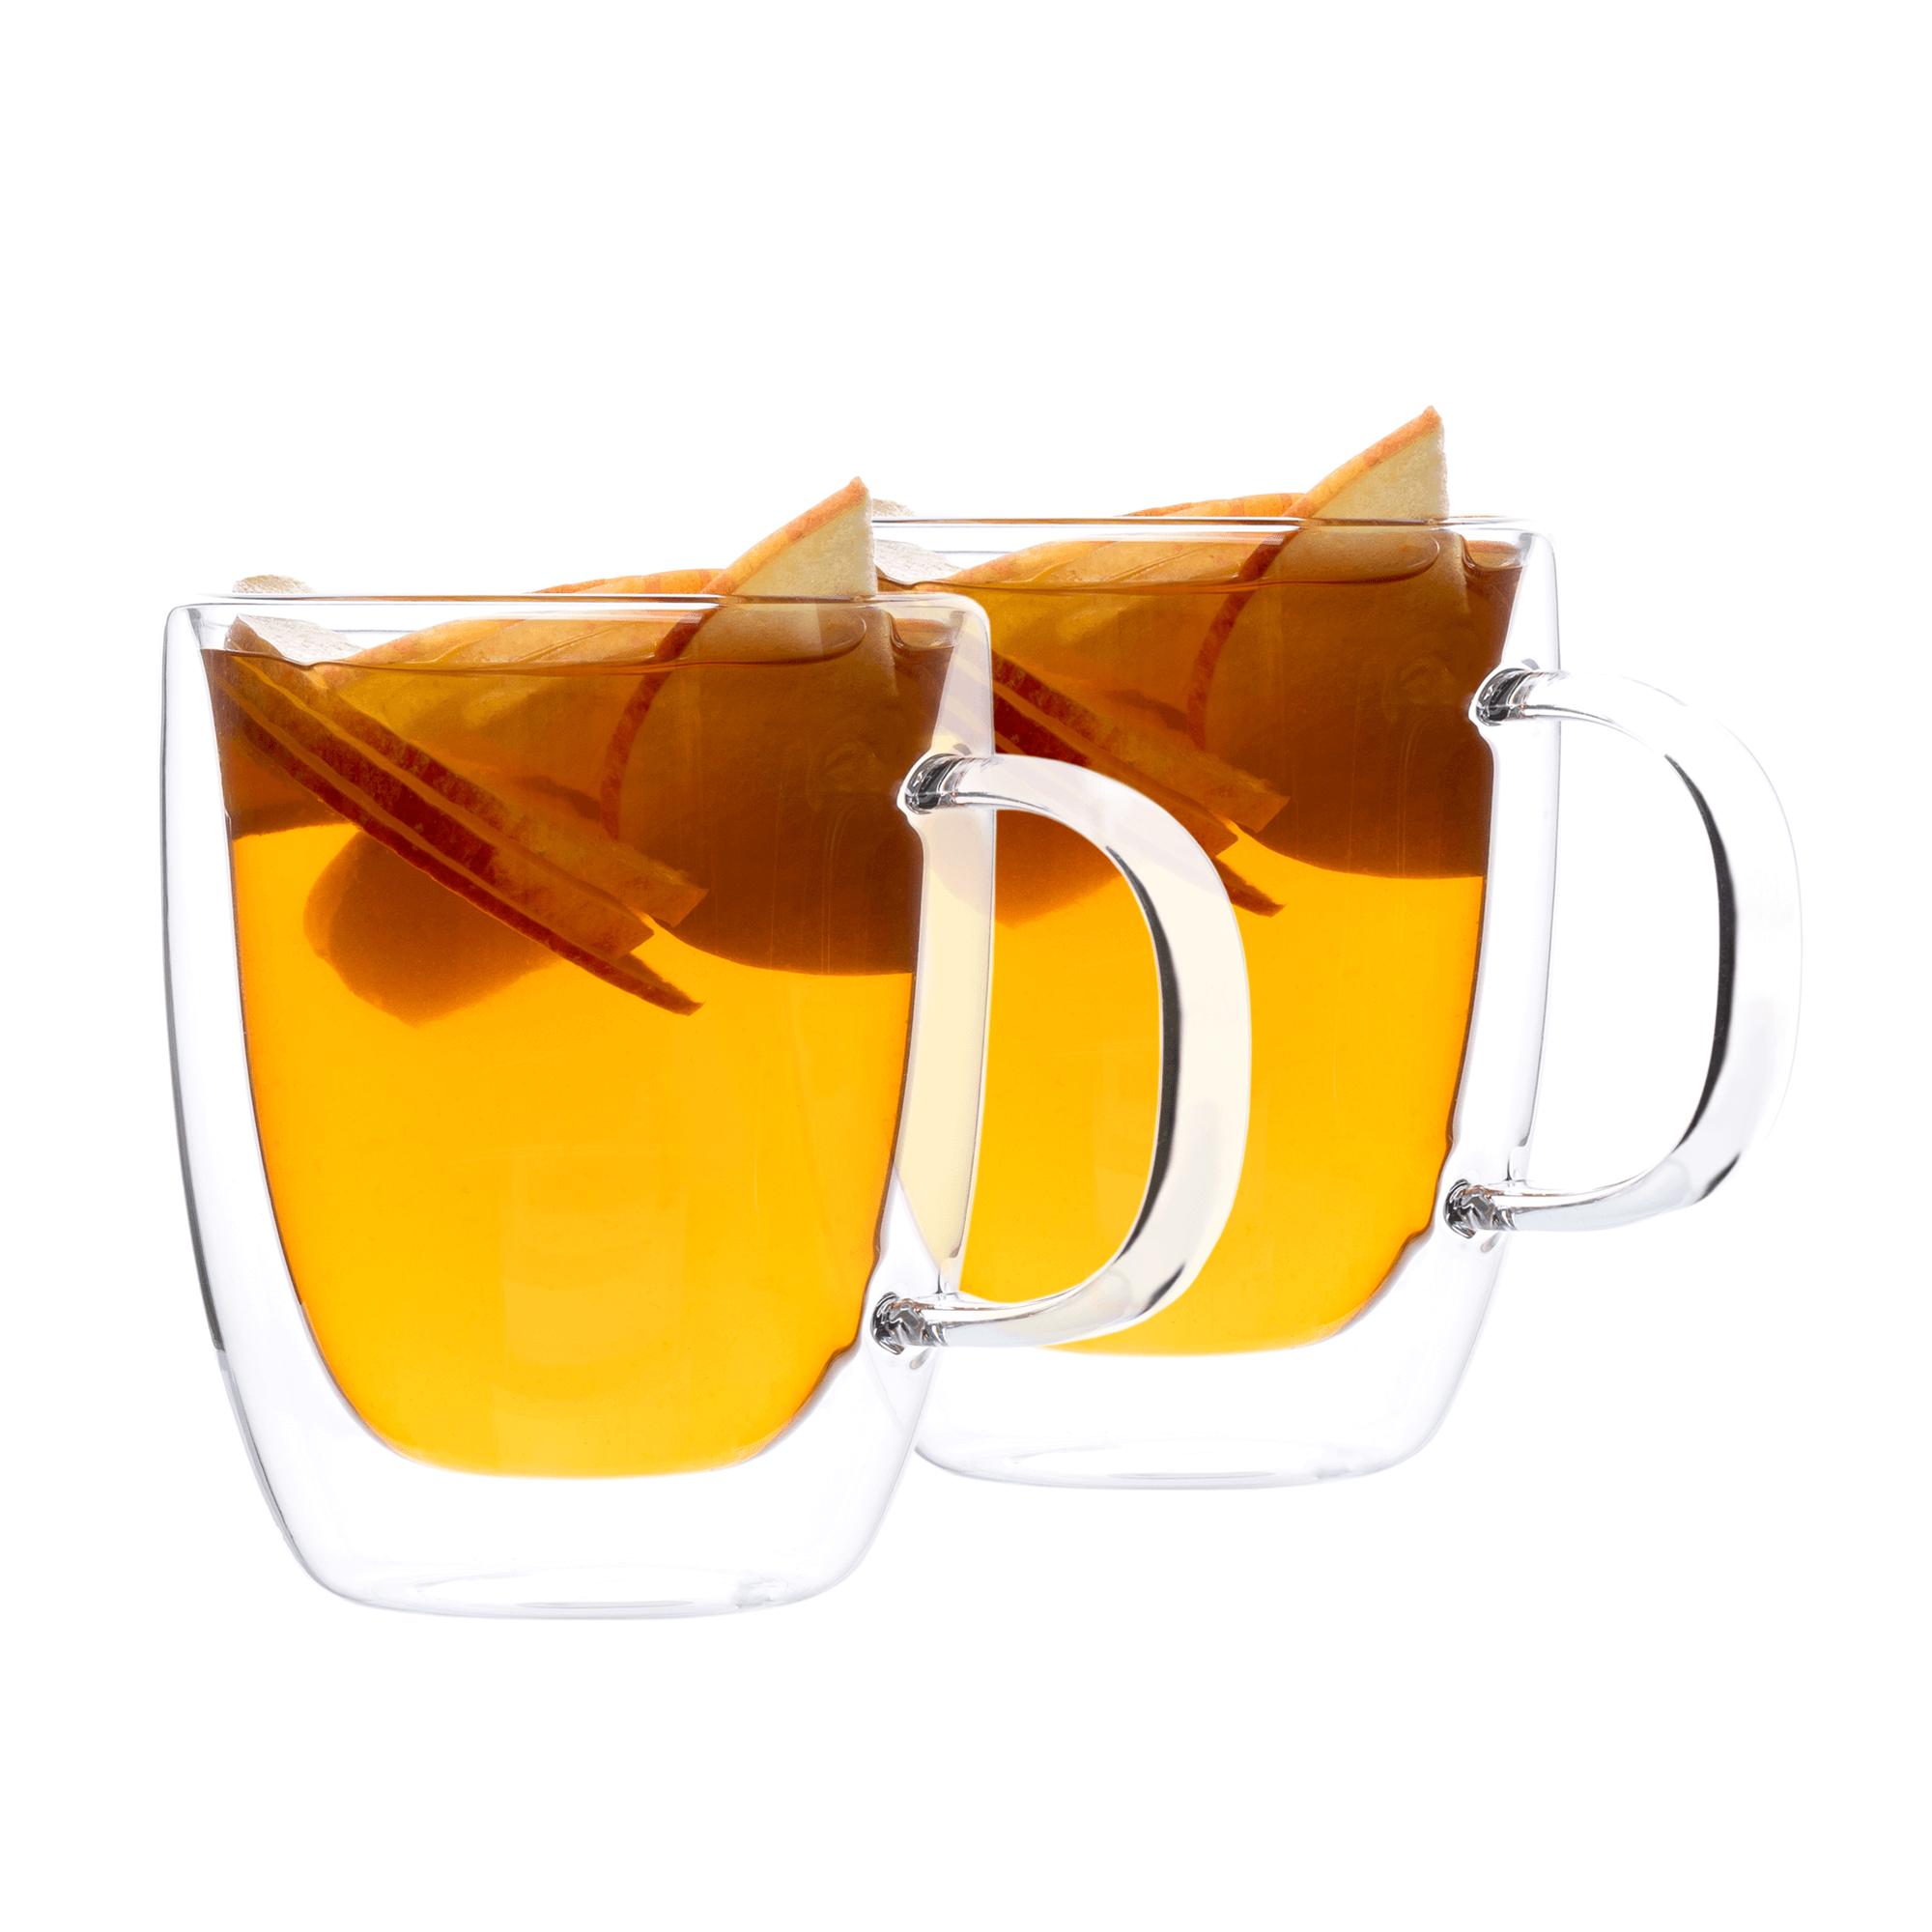 Ceaşcă de ceai termo, 2 buc., 350ml, HOTCOLD TIP 12